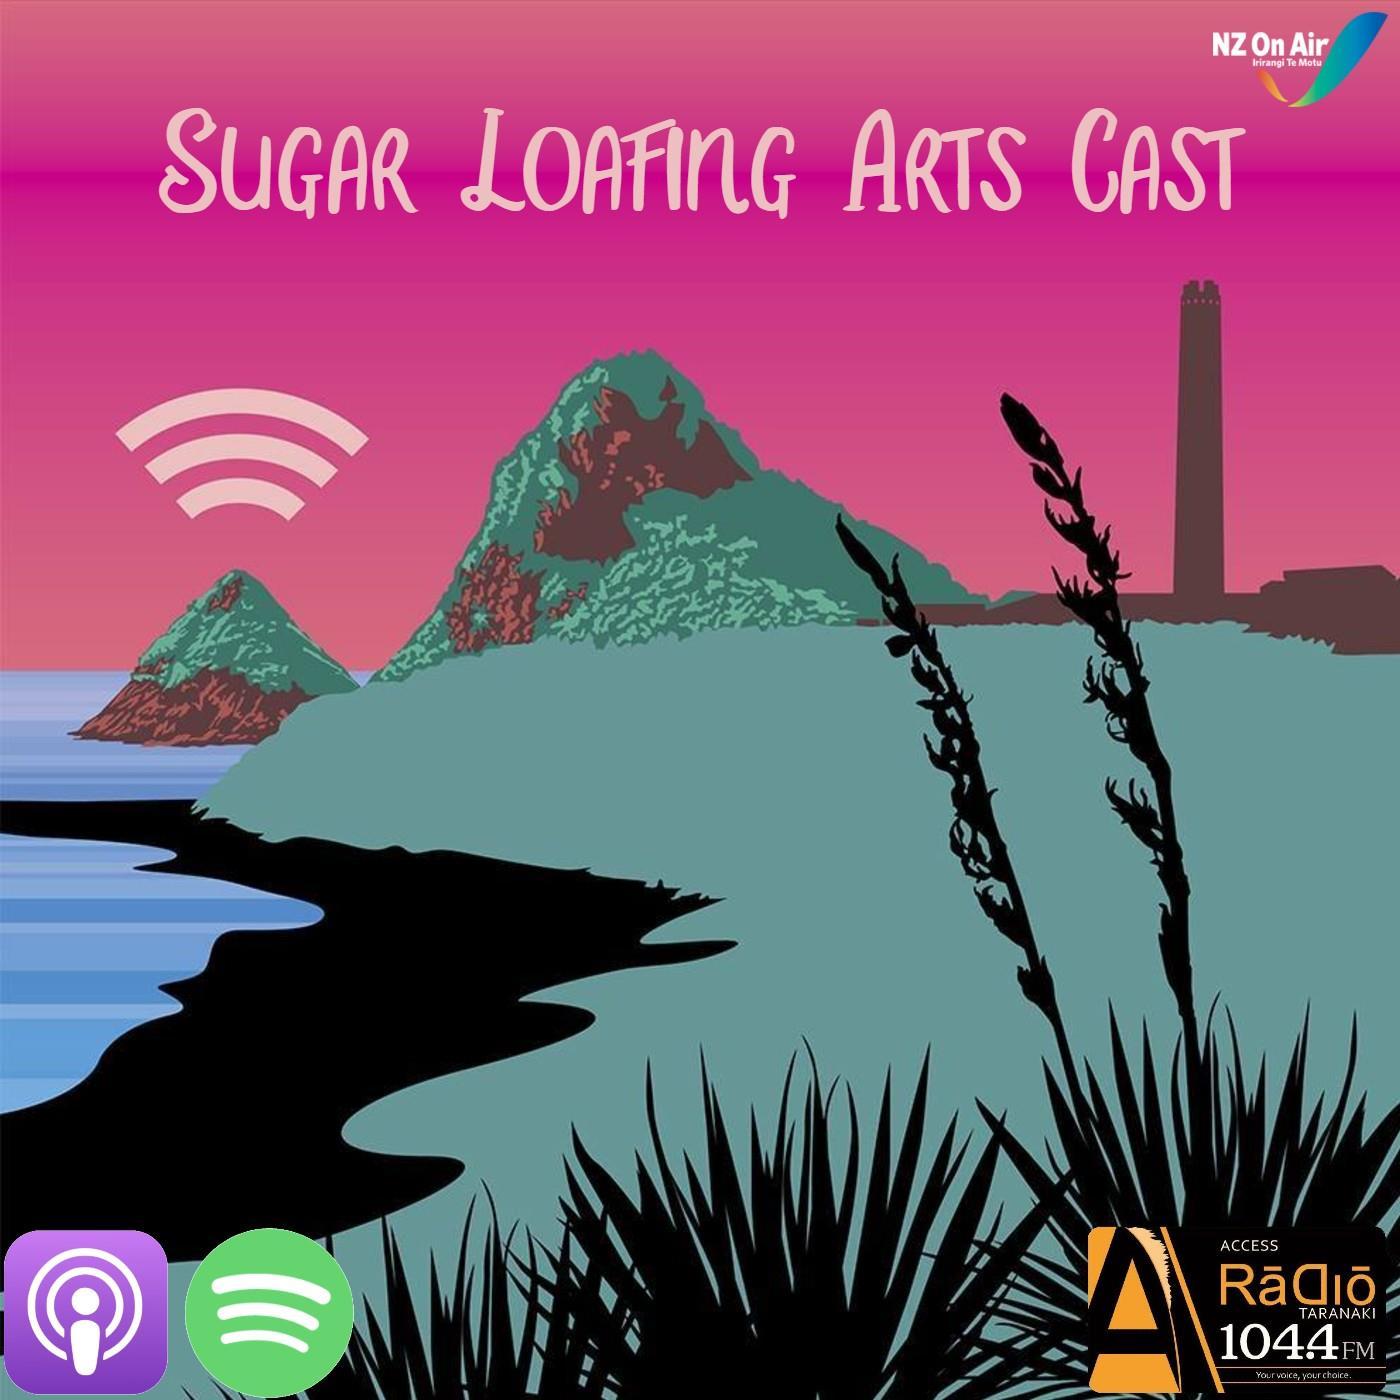 Sugar Loafing Arts Cast